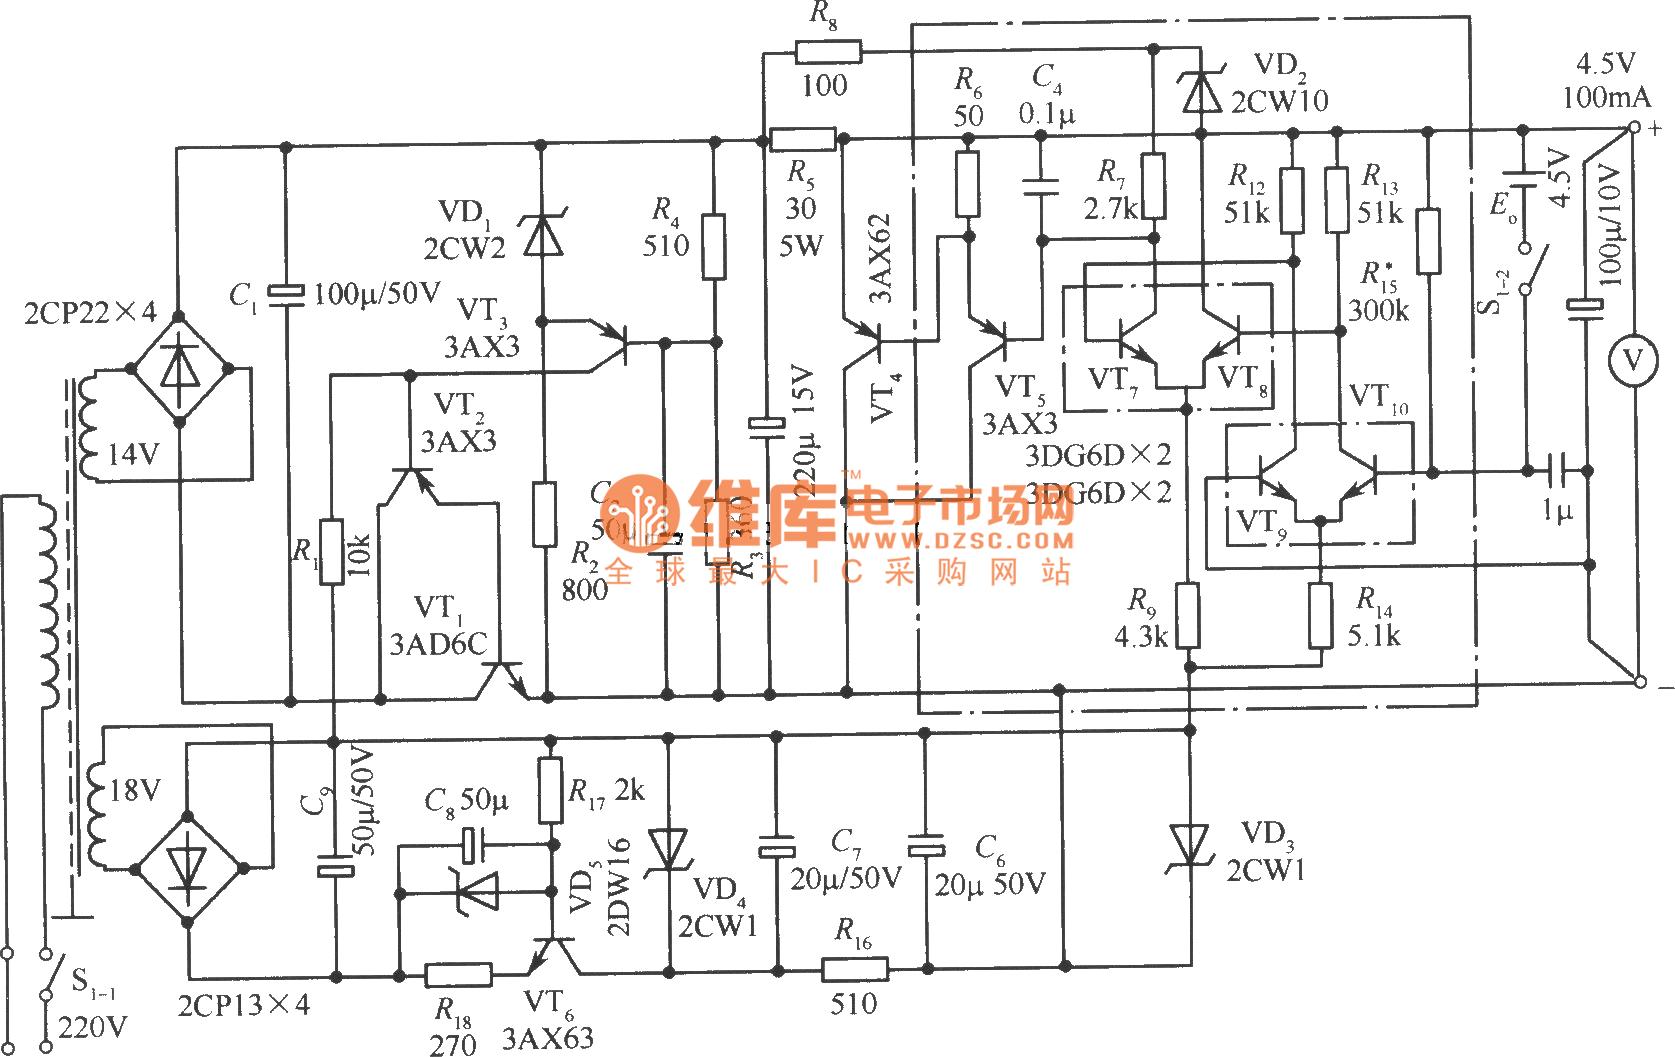 4 5v precise power supply circuit - power supply circuit - circuit diagram